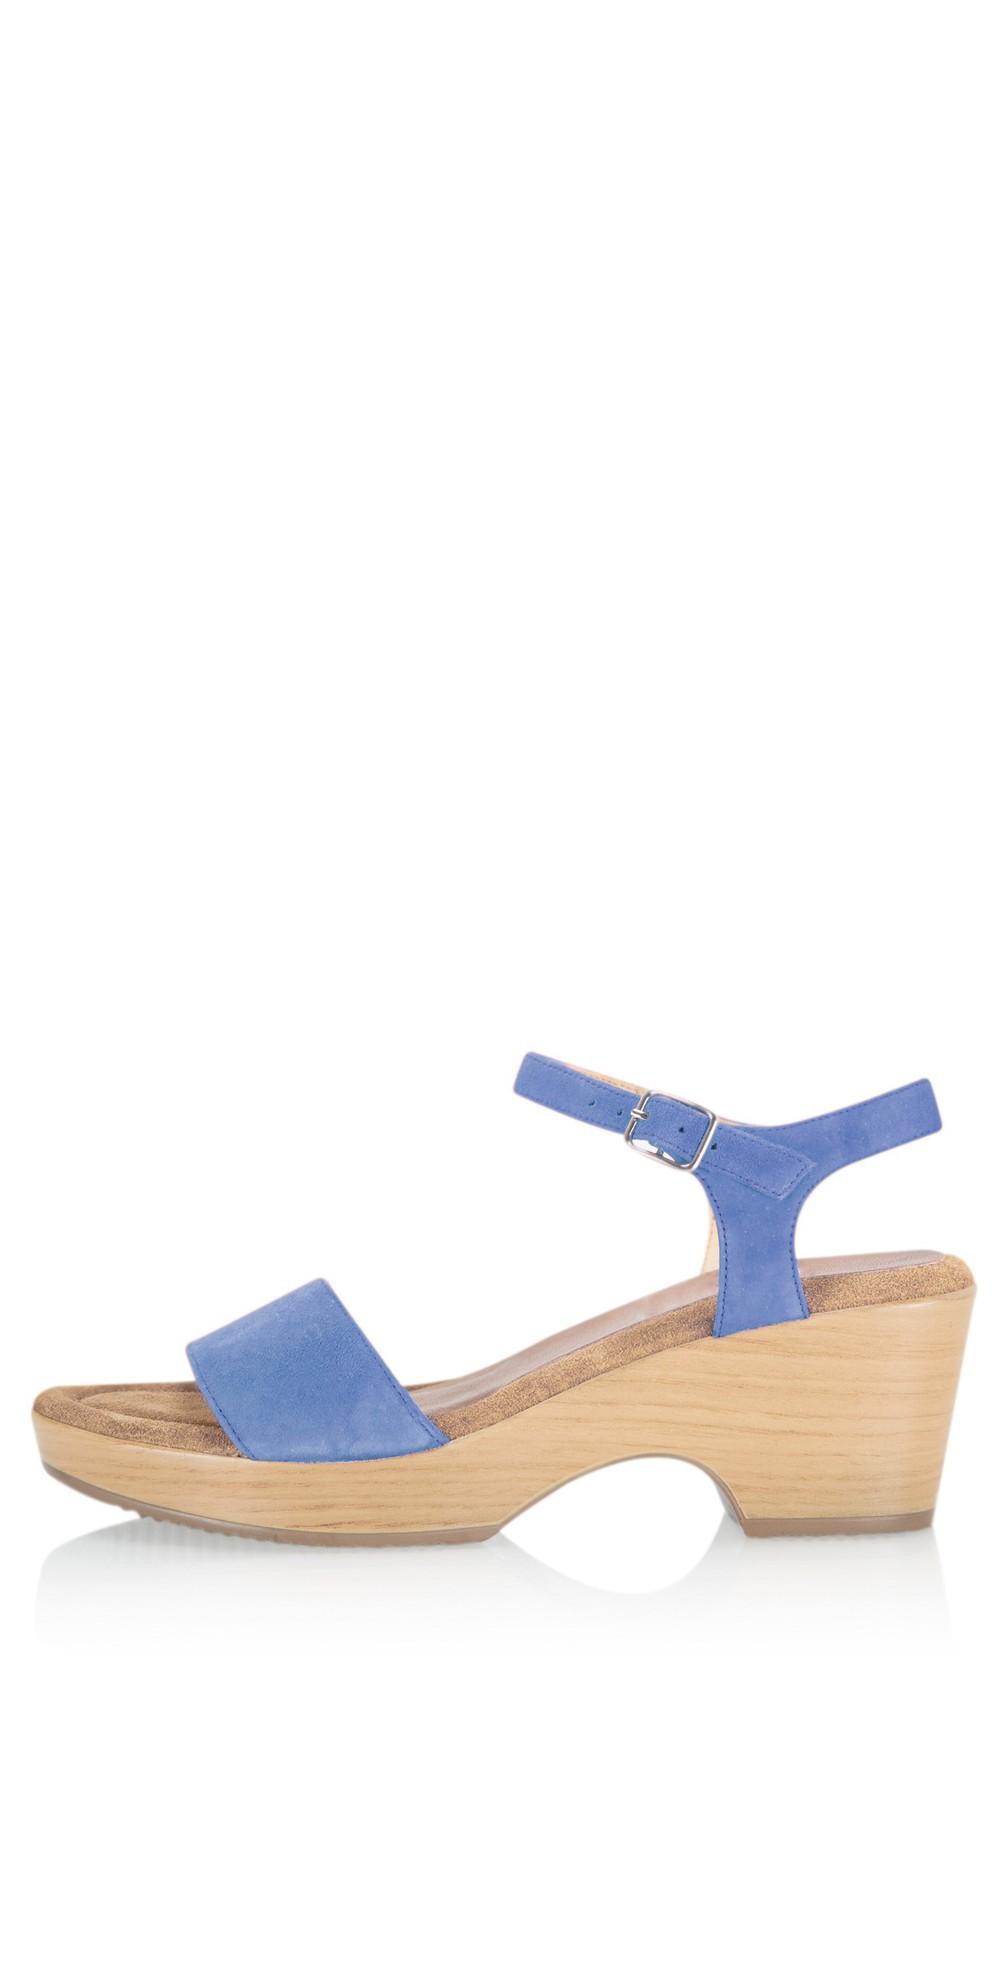 Aneka Icon Anton Blue Suede Wedge Sandal main image